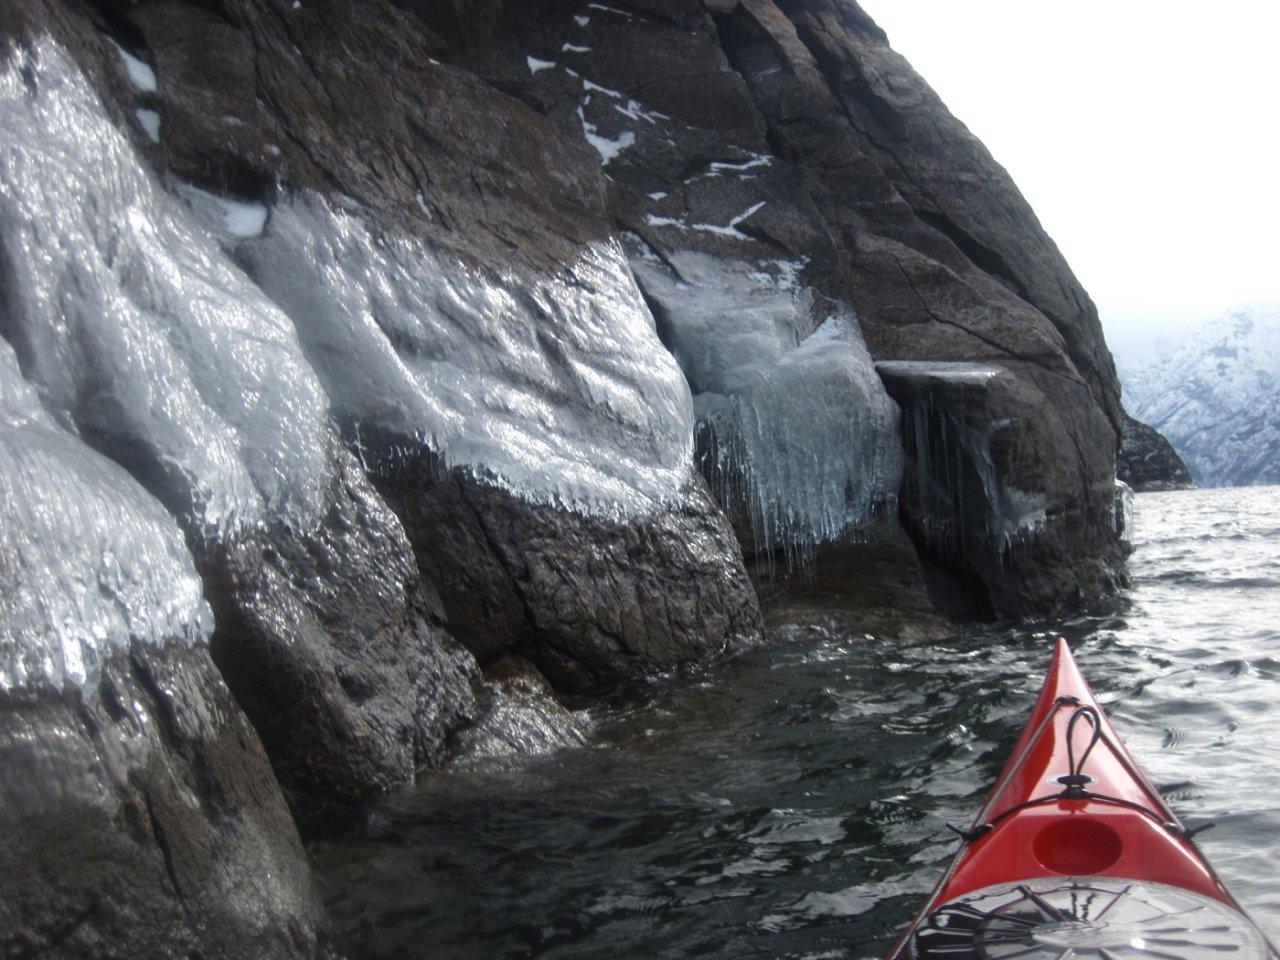 08 Ice-lined shore.JPG